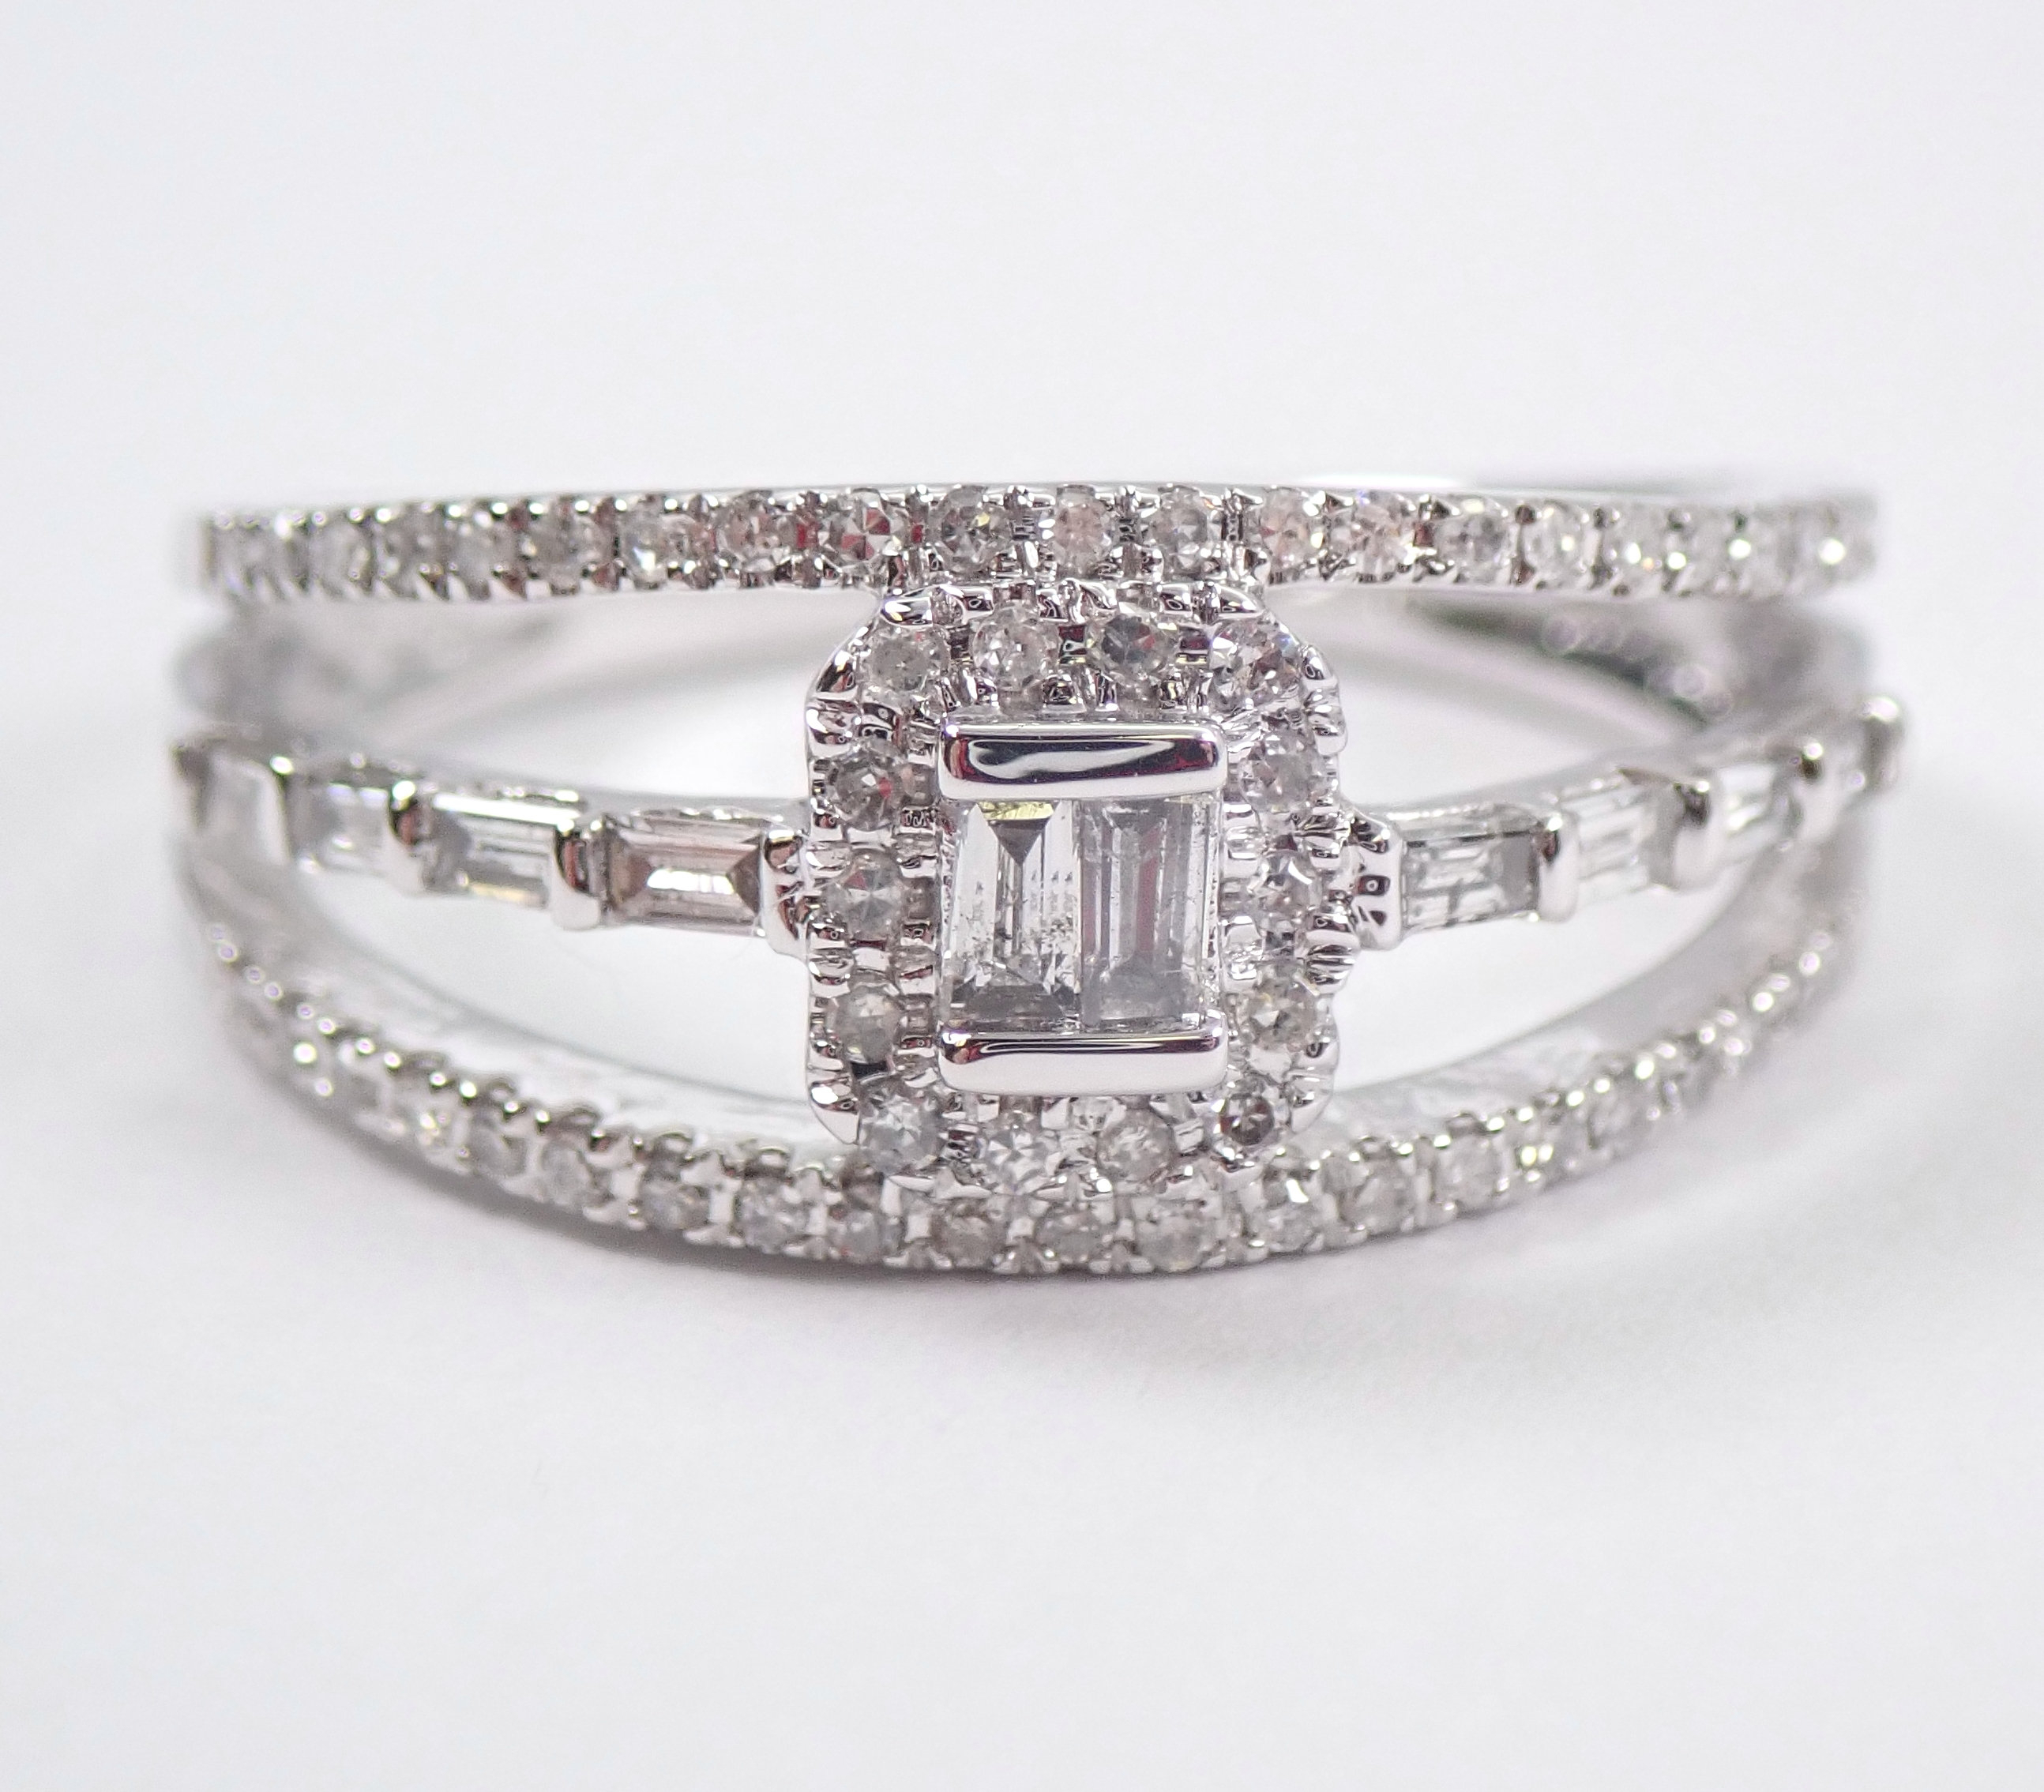 14K White Gold Diamond Engagement Ring Multi Row Anniversary Band Size 7 Regarding Newest Diamond Seven Row Anniversary Rings In White Gold (View 4 of 25)